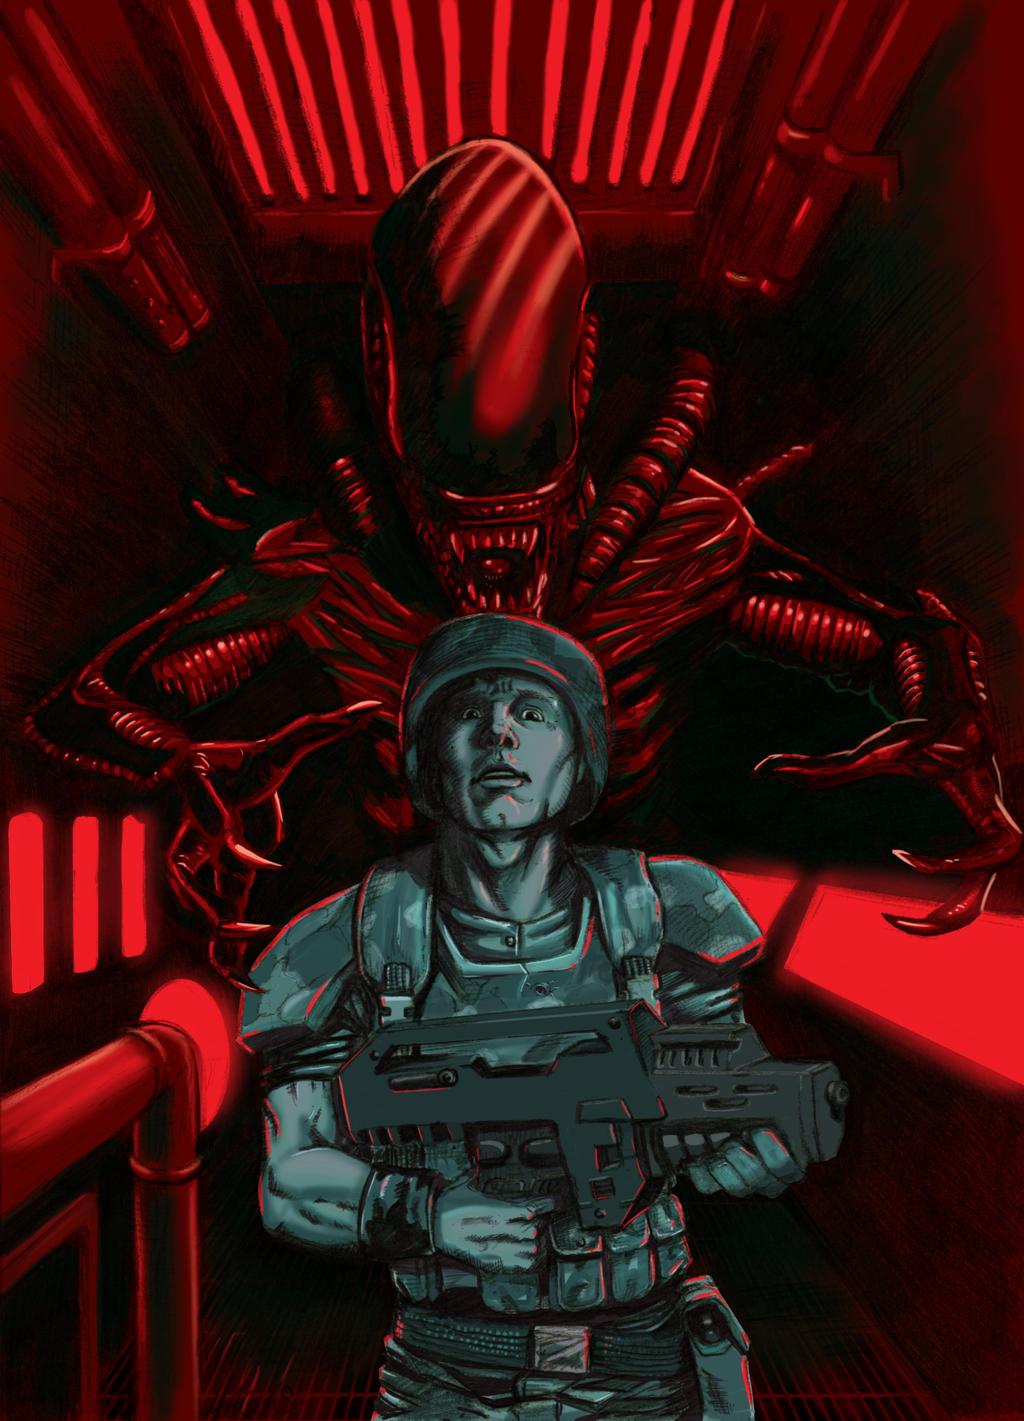 Aliens i gotta bad bad feeling by EmanuelMacias